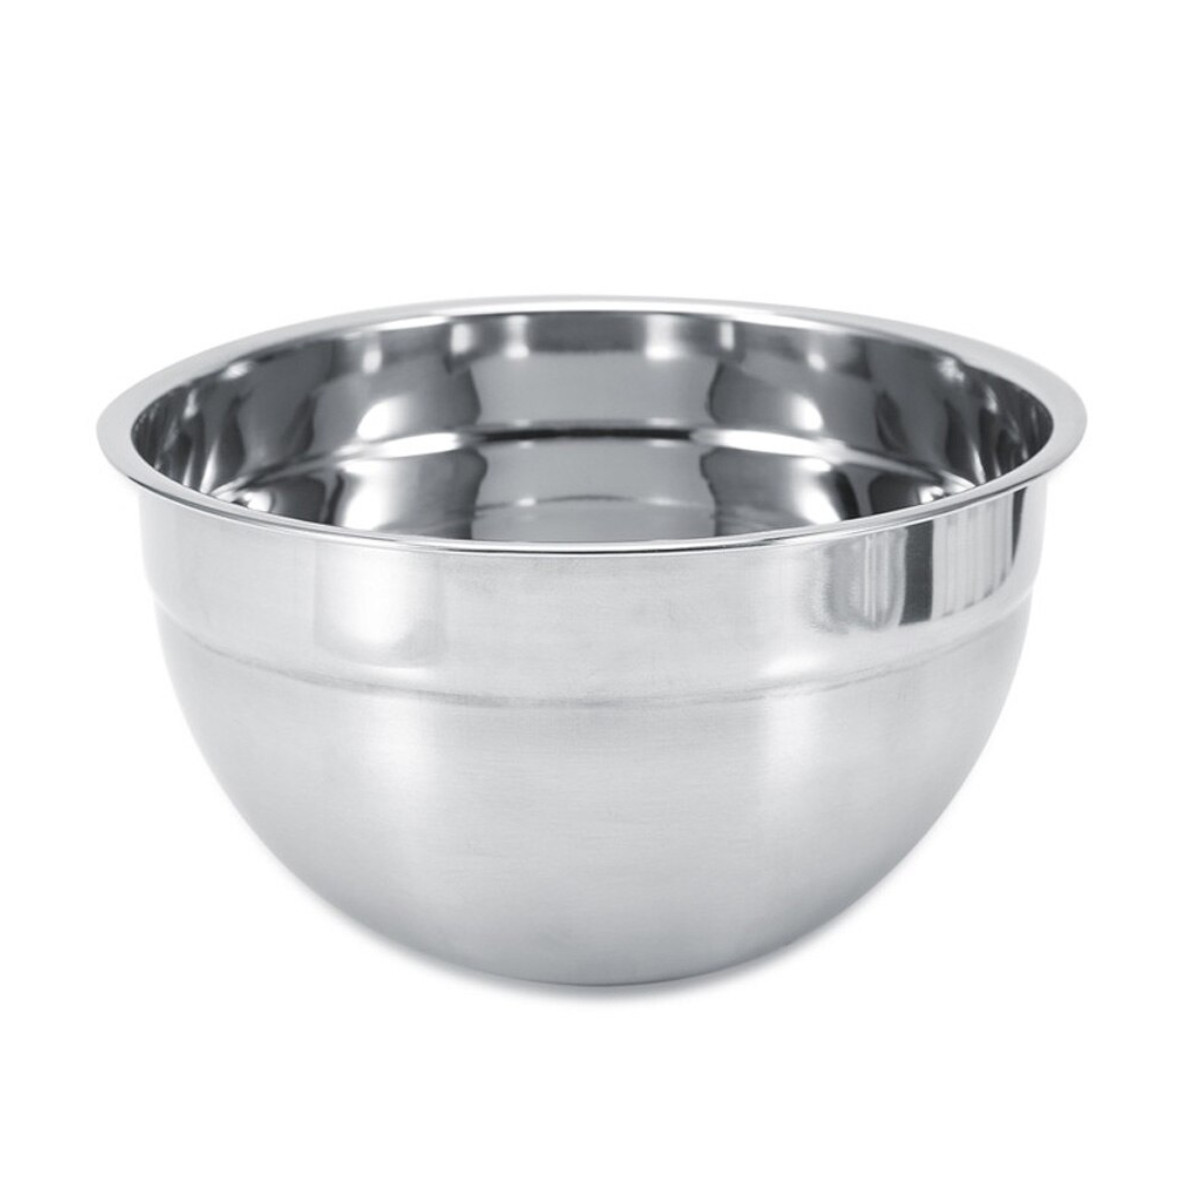 Tigela Bowl Aço Inox 28cm Multiuso Profissional